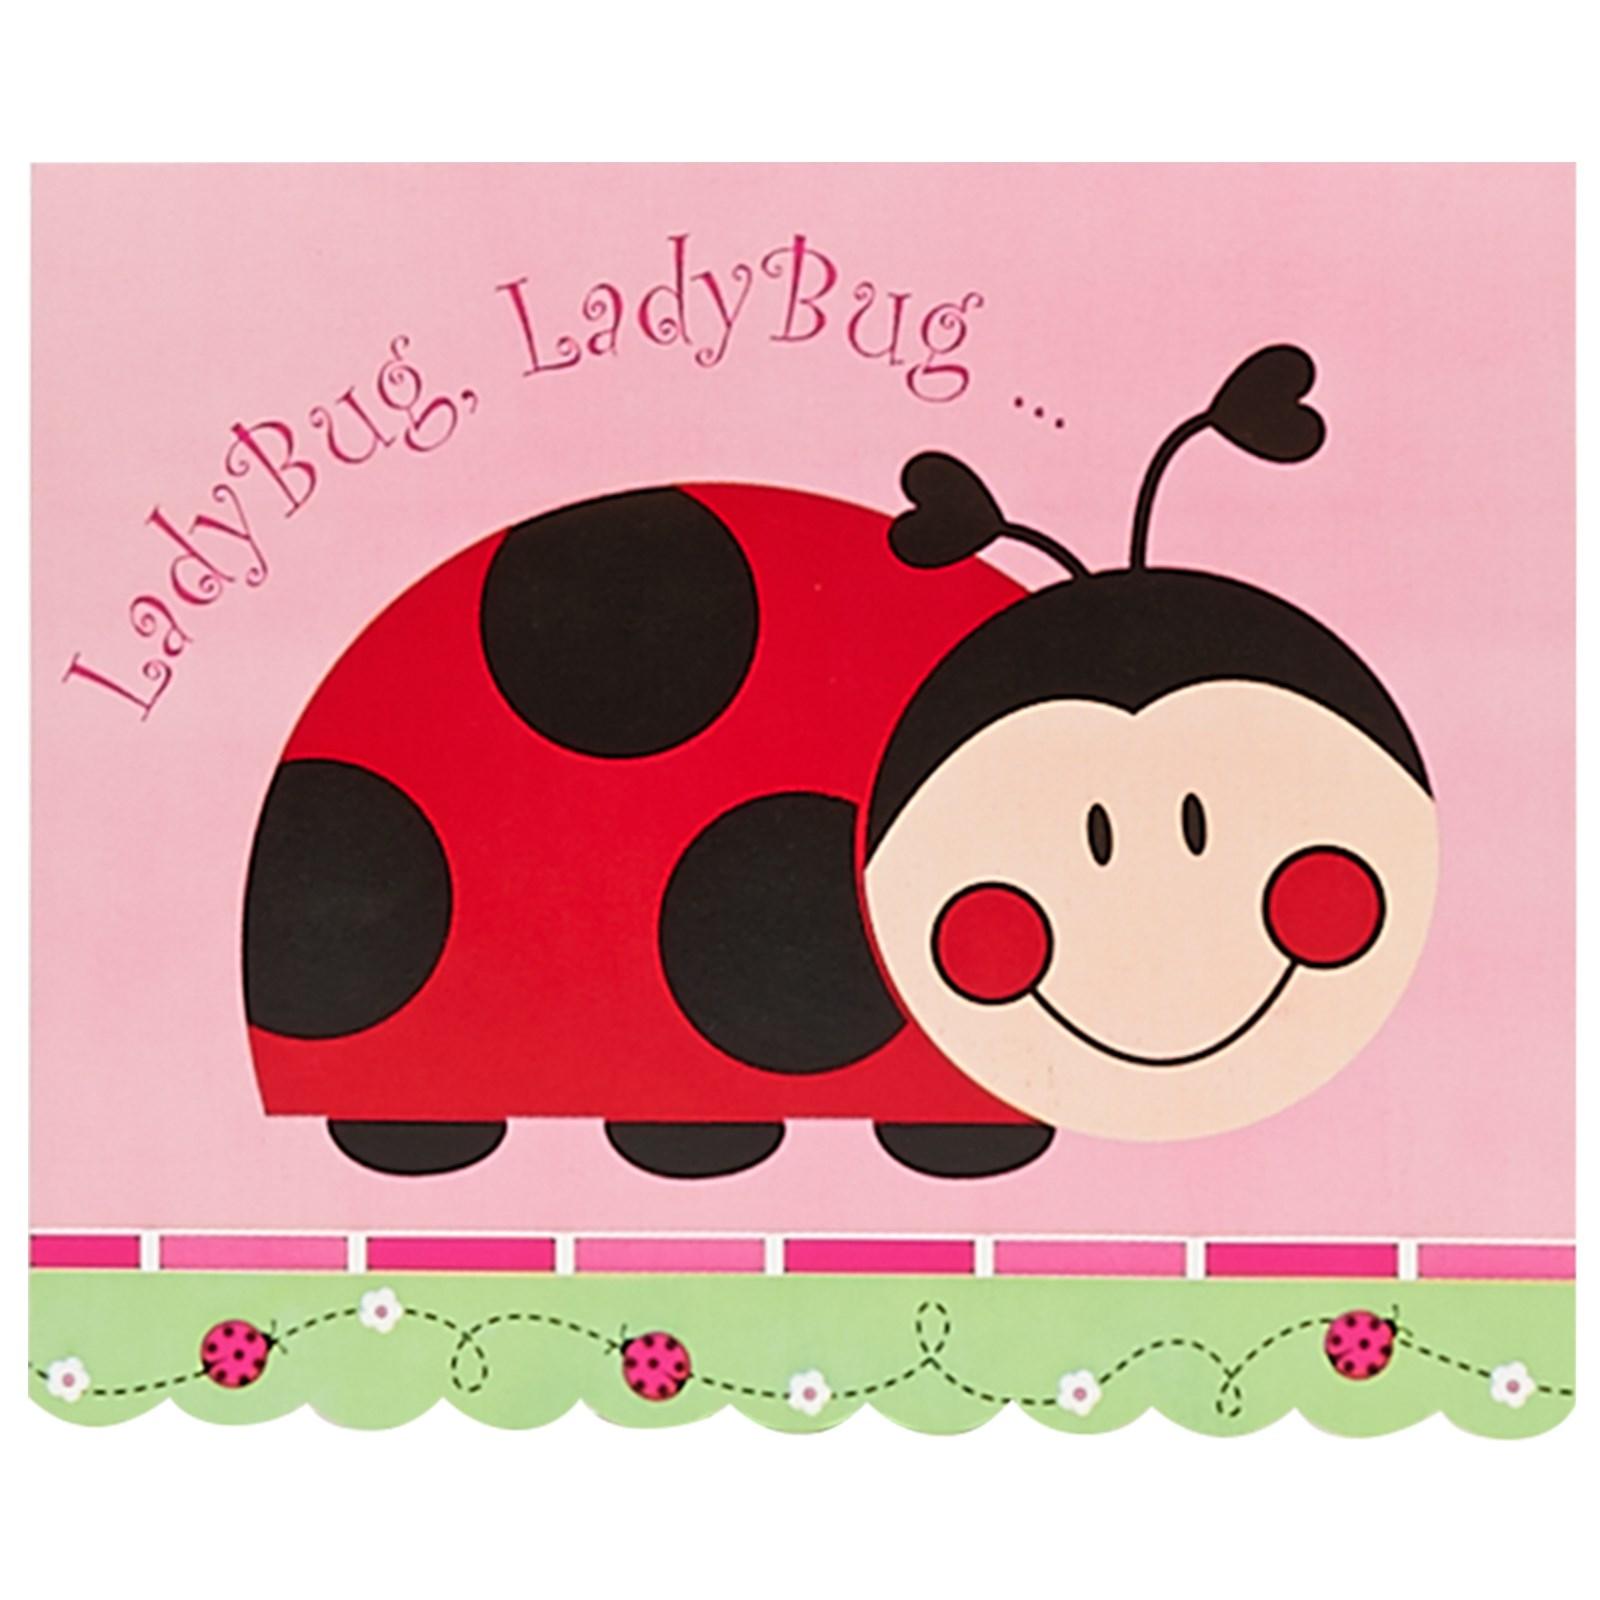 Ladybugs oh so sweet 2nd birthday invitations birthdayexpress com